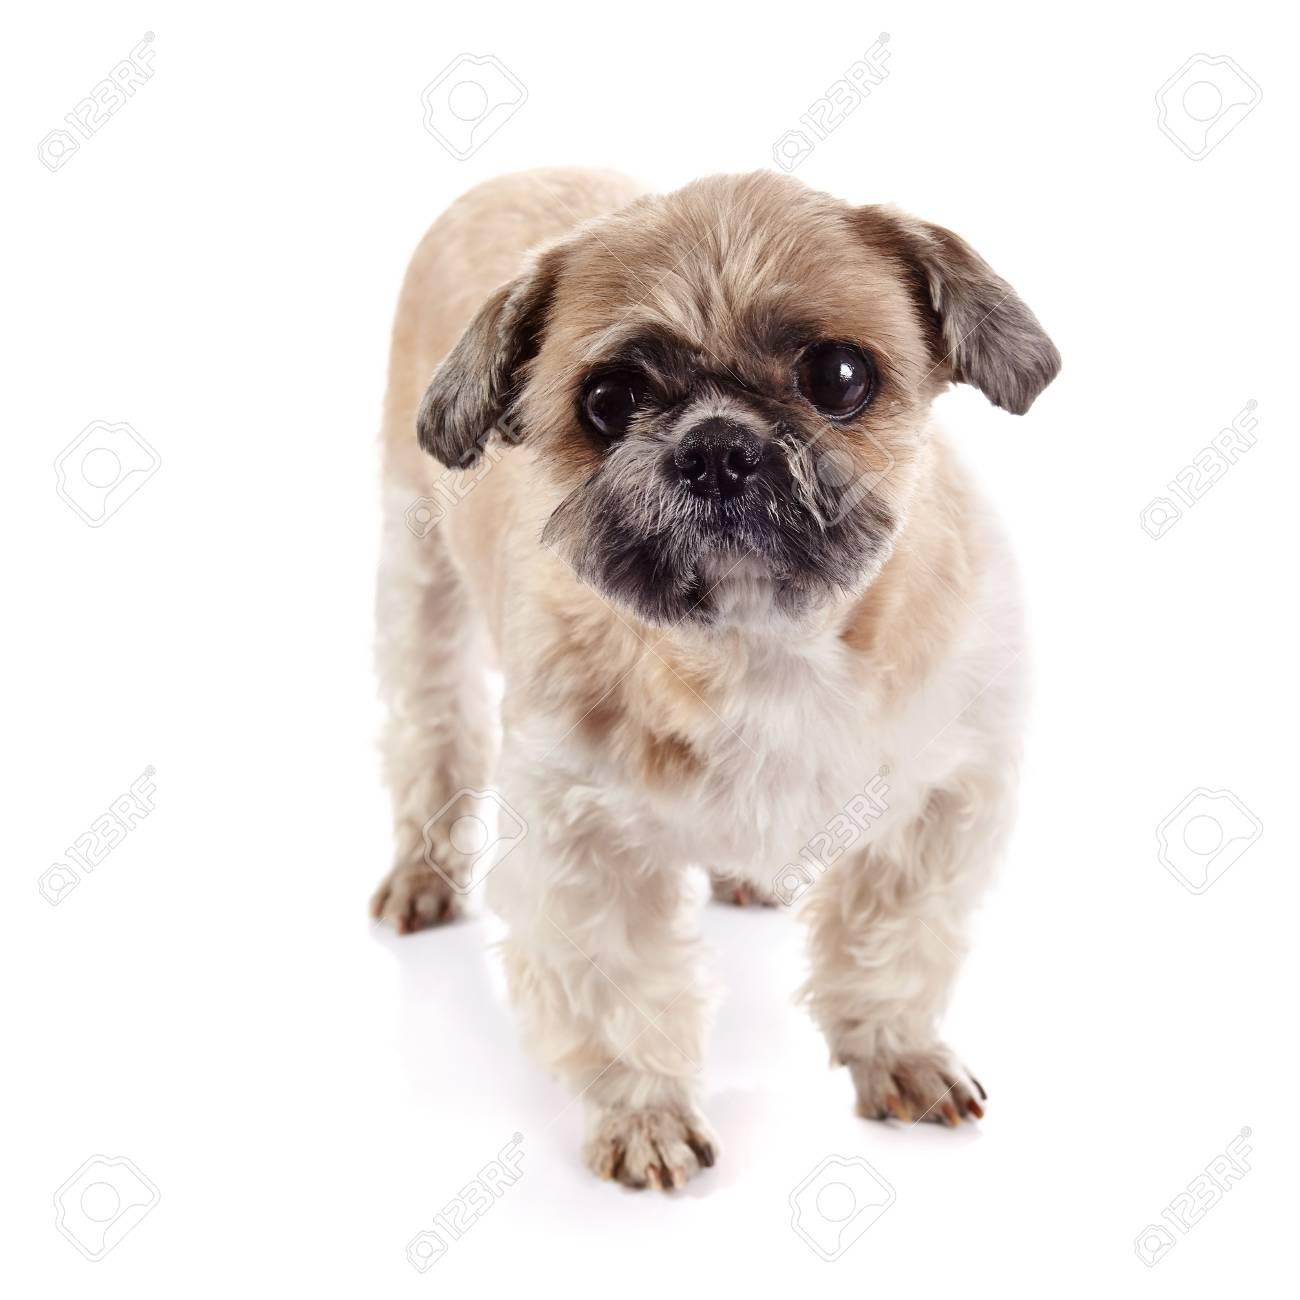 Decorative Amusing Small Beige Doggie Of Breed Of A Shih Tzu Stock